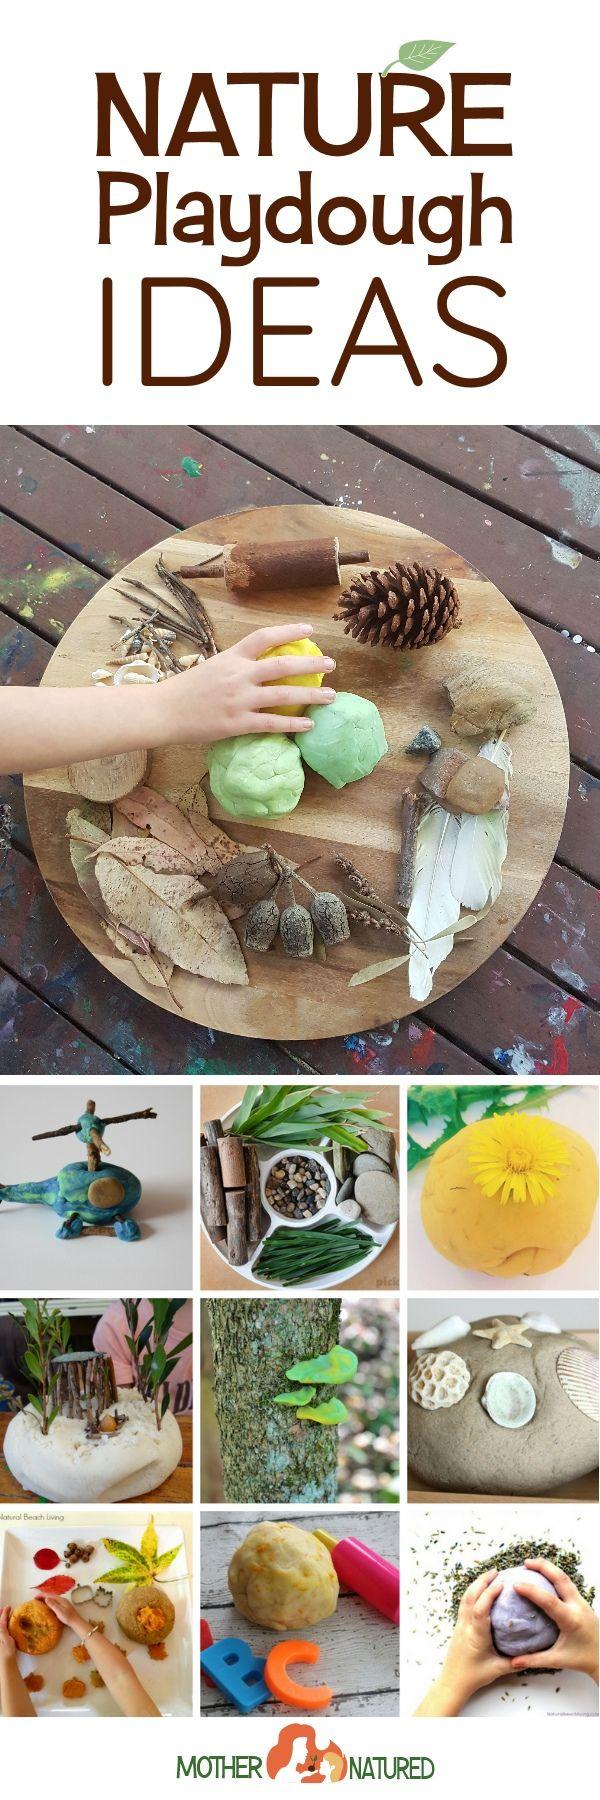 Nature playdough ideas | Natural playdough Ideas | Nature play